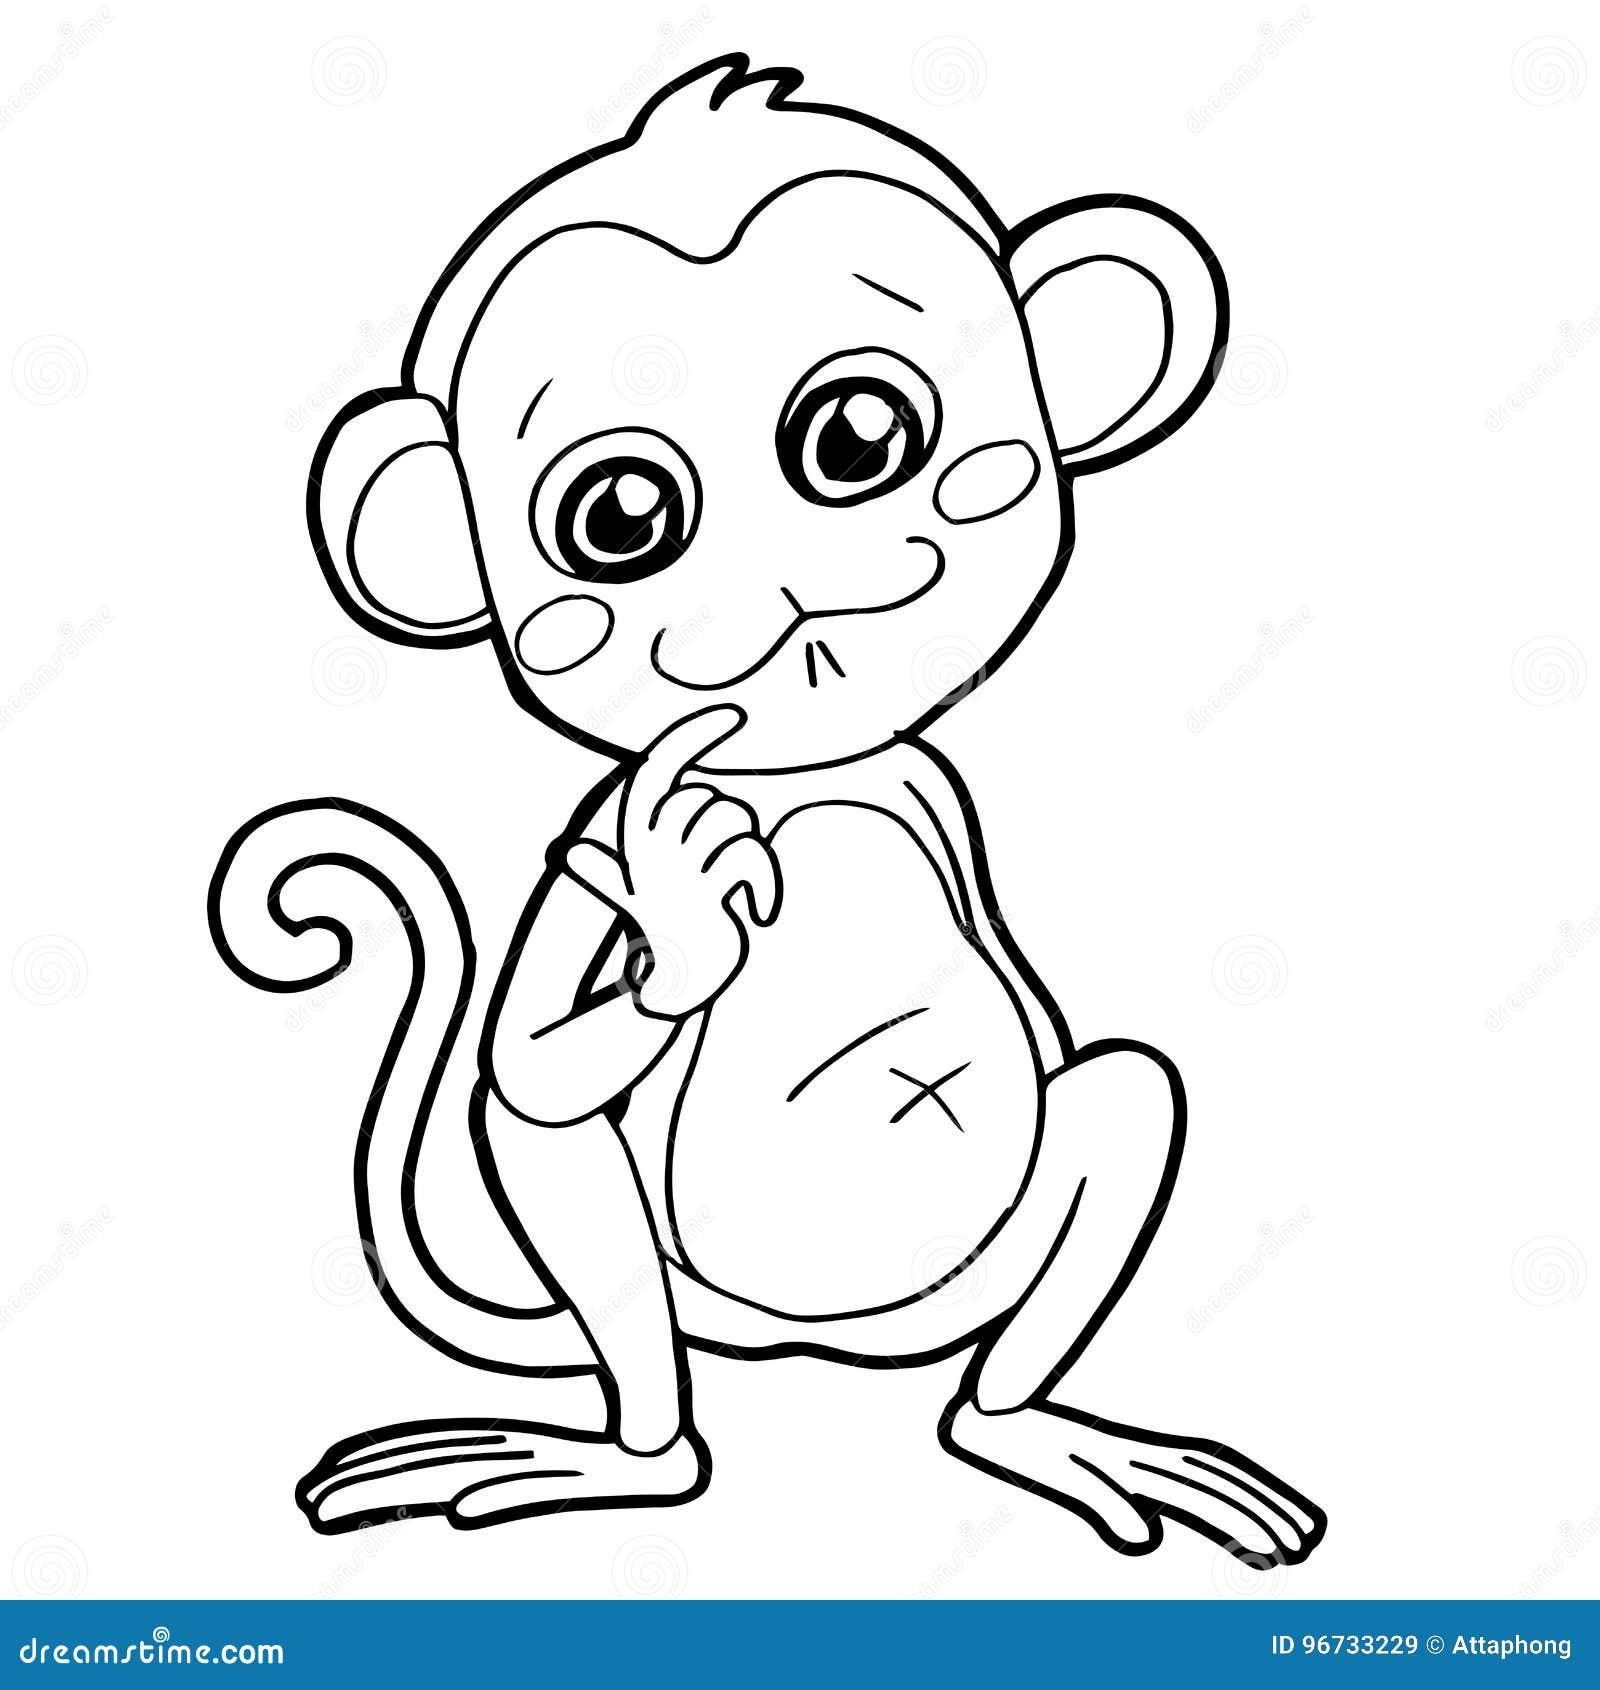 Cartoon Cute Monkey Coloring Page Vector Stock Vector - Illustration ...